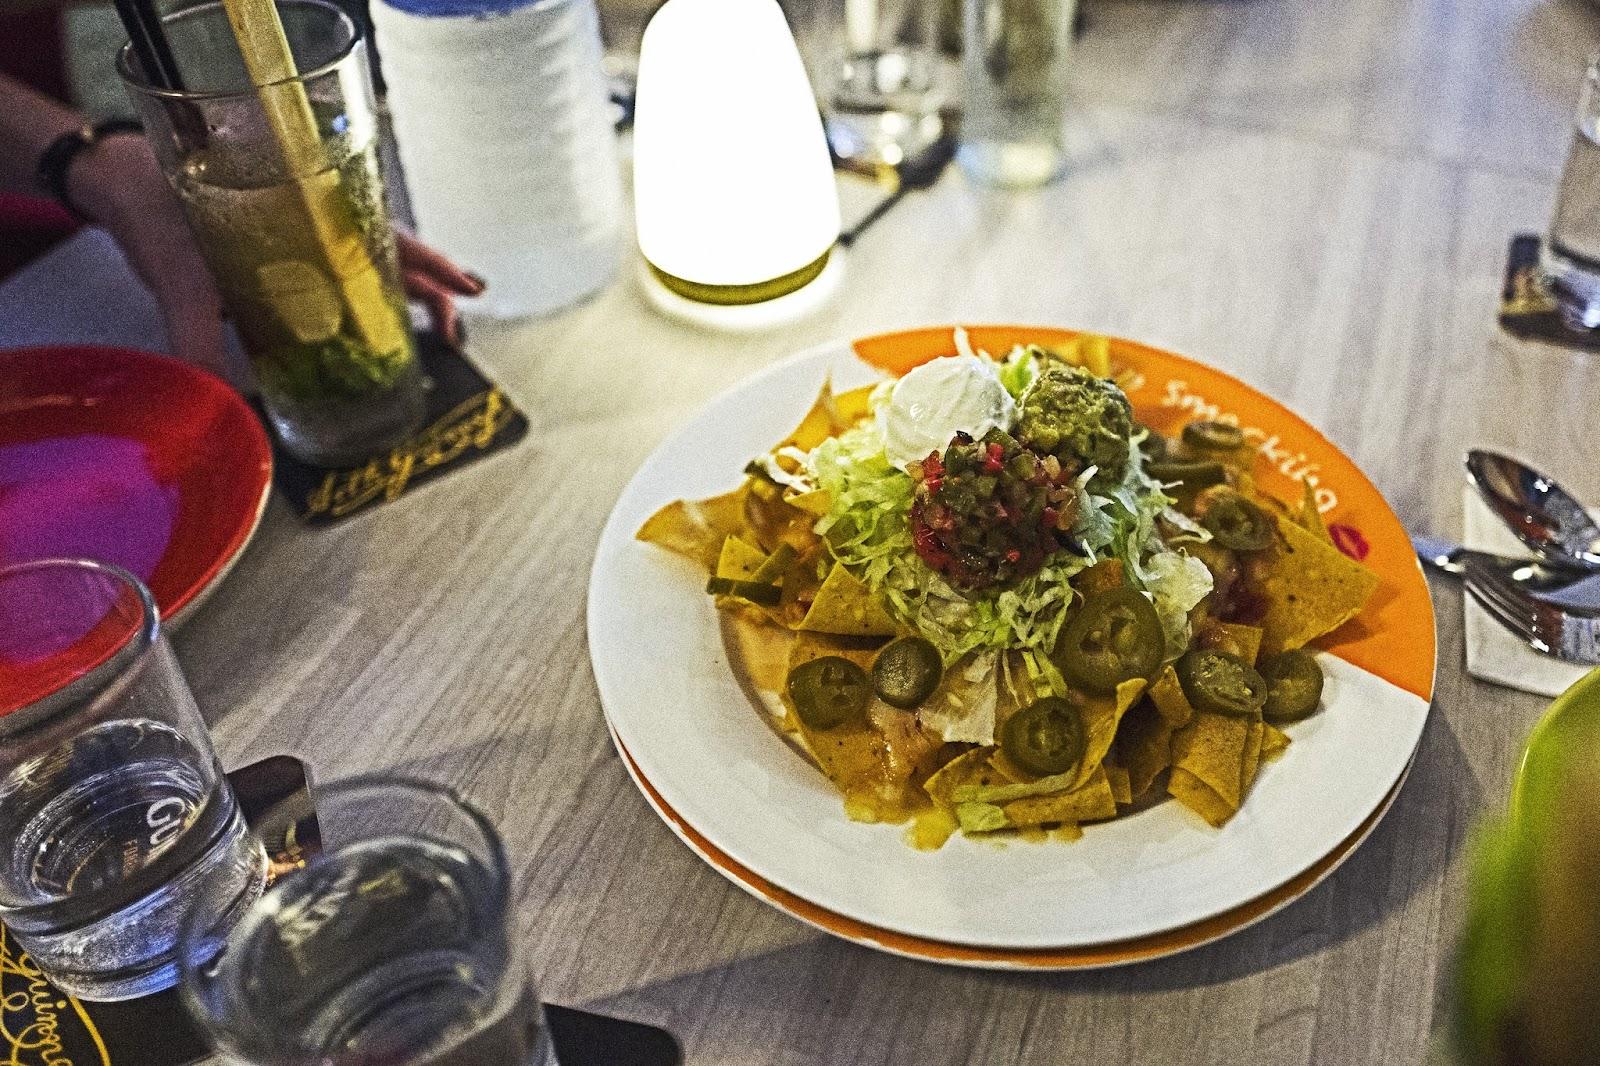 f-nachos-L1050713.jpg